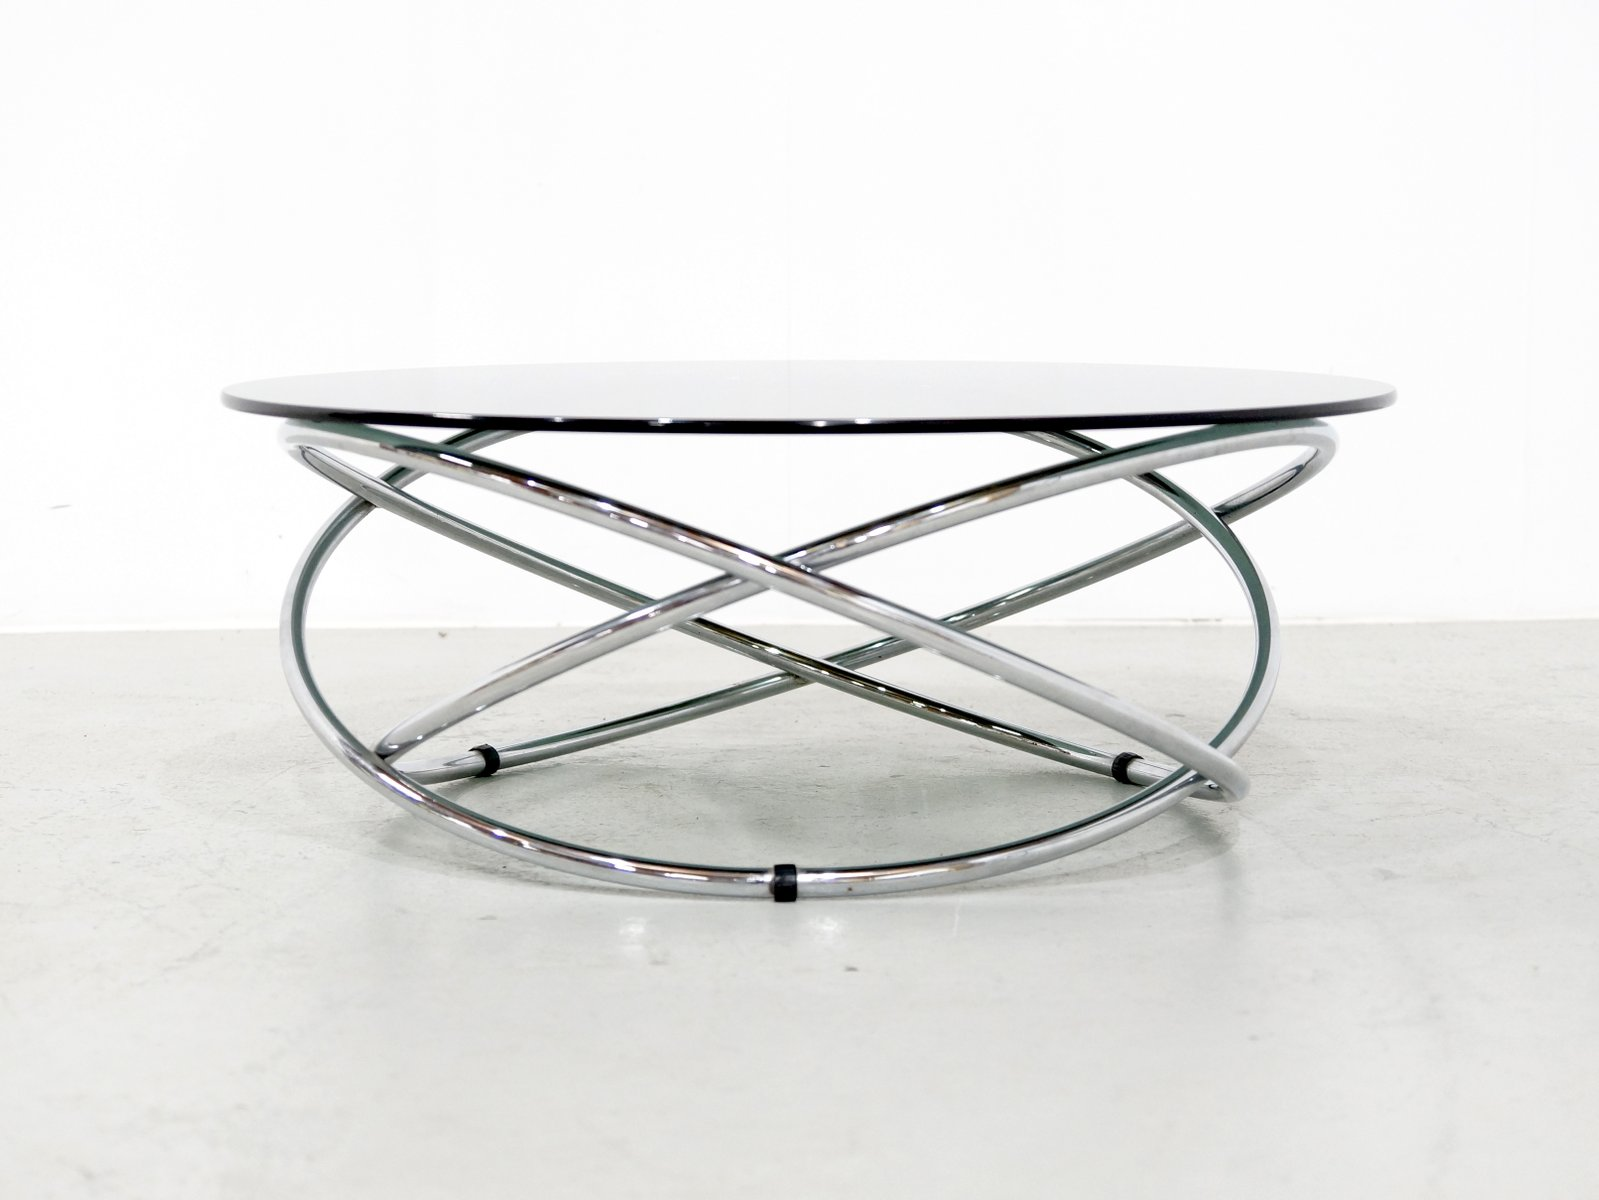 Italian Chrome & Smoked Glass Coffee Table 1960s for sale at Pamono